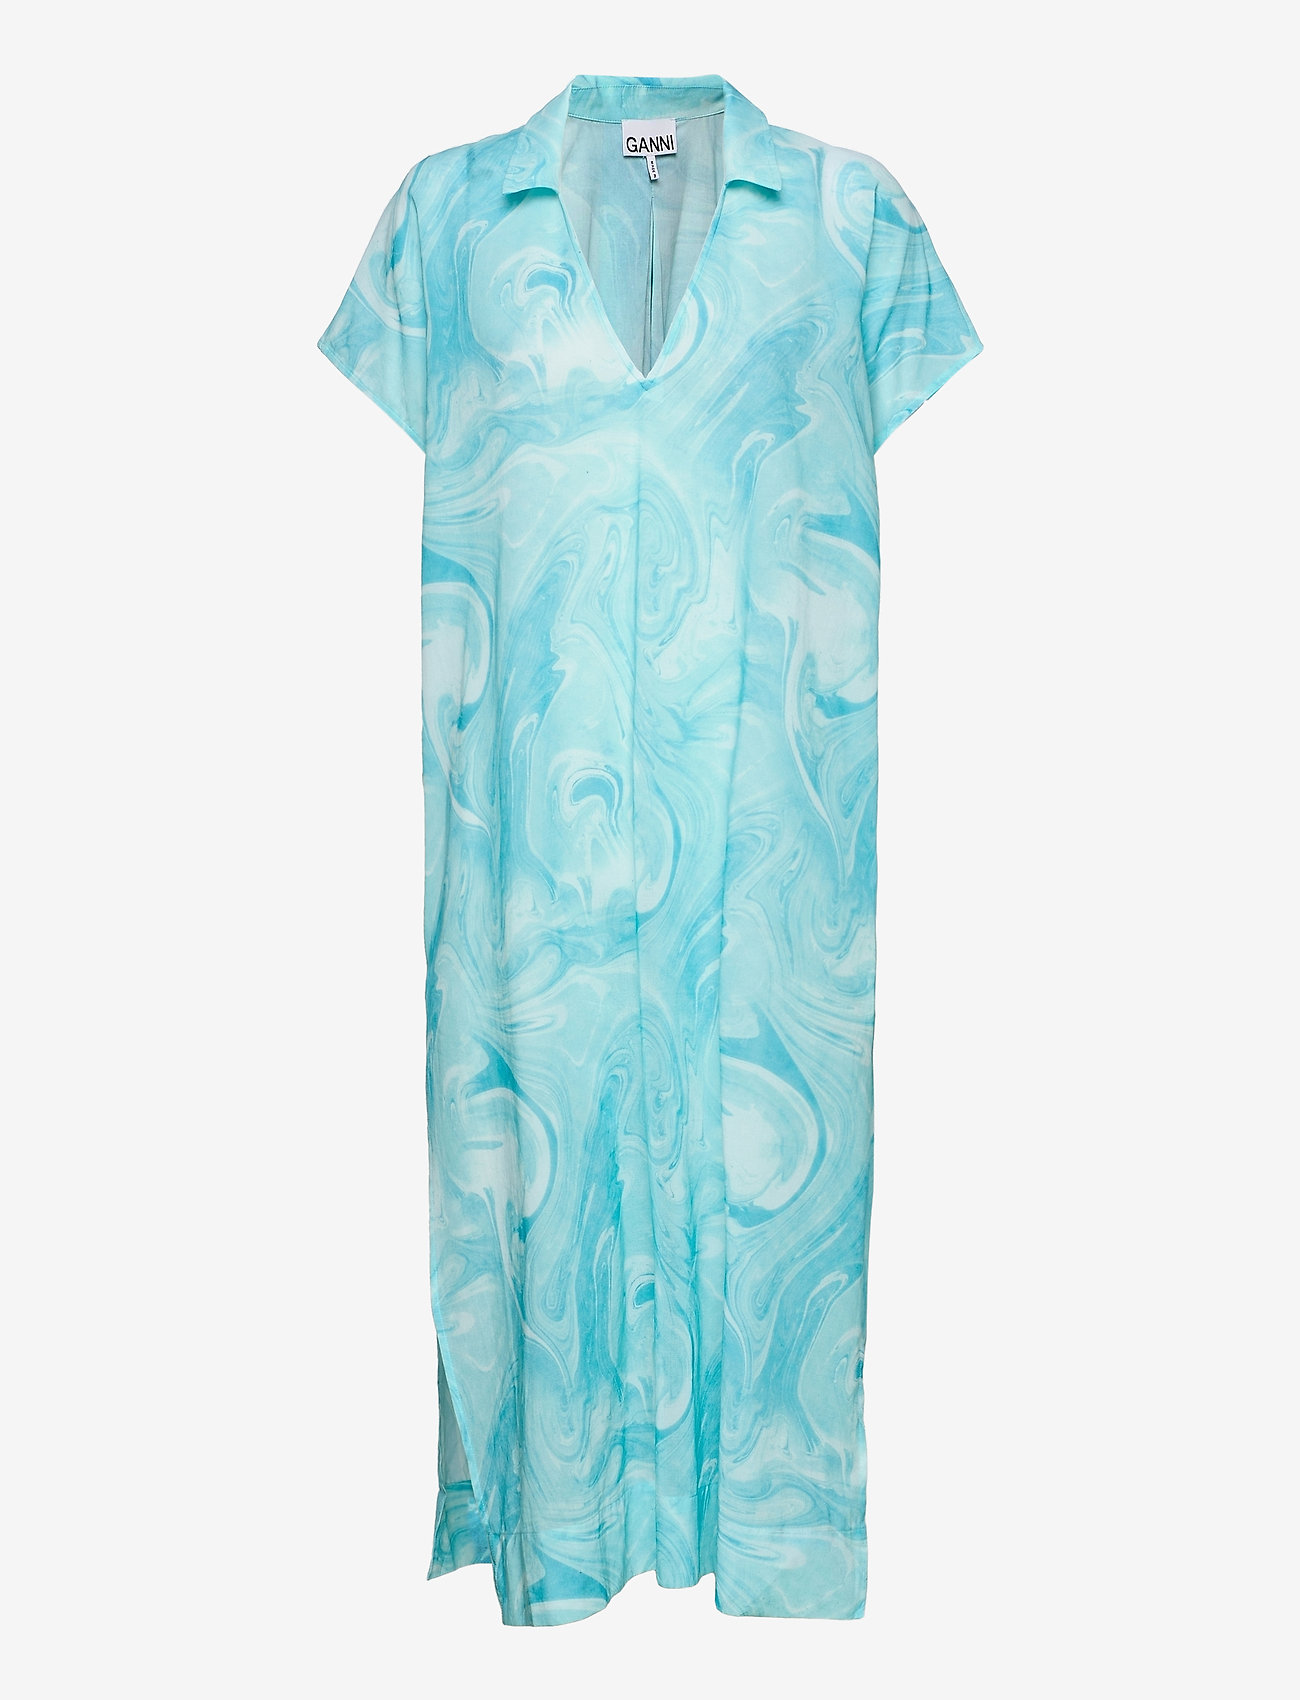 Ganni - Light Cotton - strandtøj - bachelor blue - 0